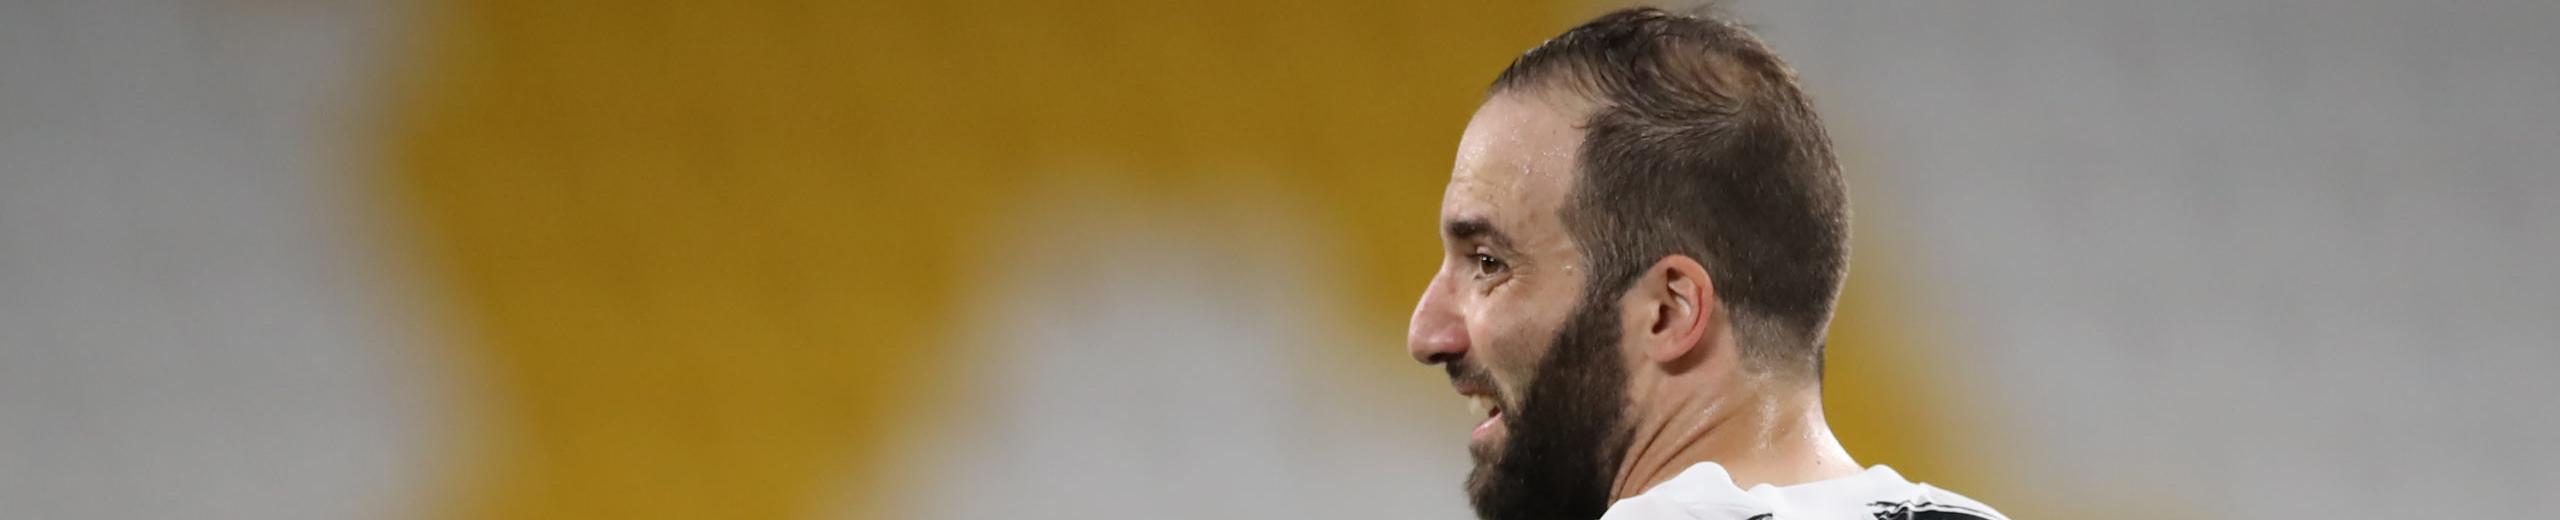 Pronostico Juventus-Lione, Sarri si affida a Higuain: ultimissime e probabili formazioni